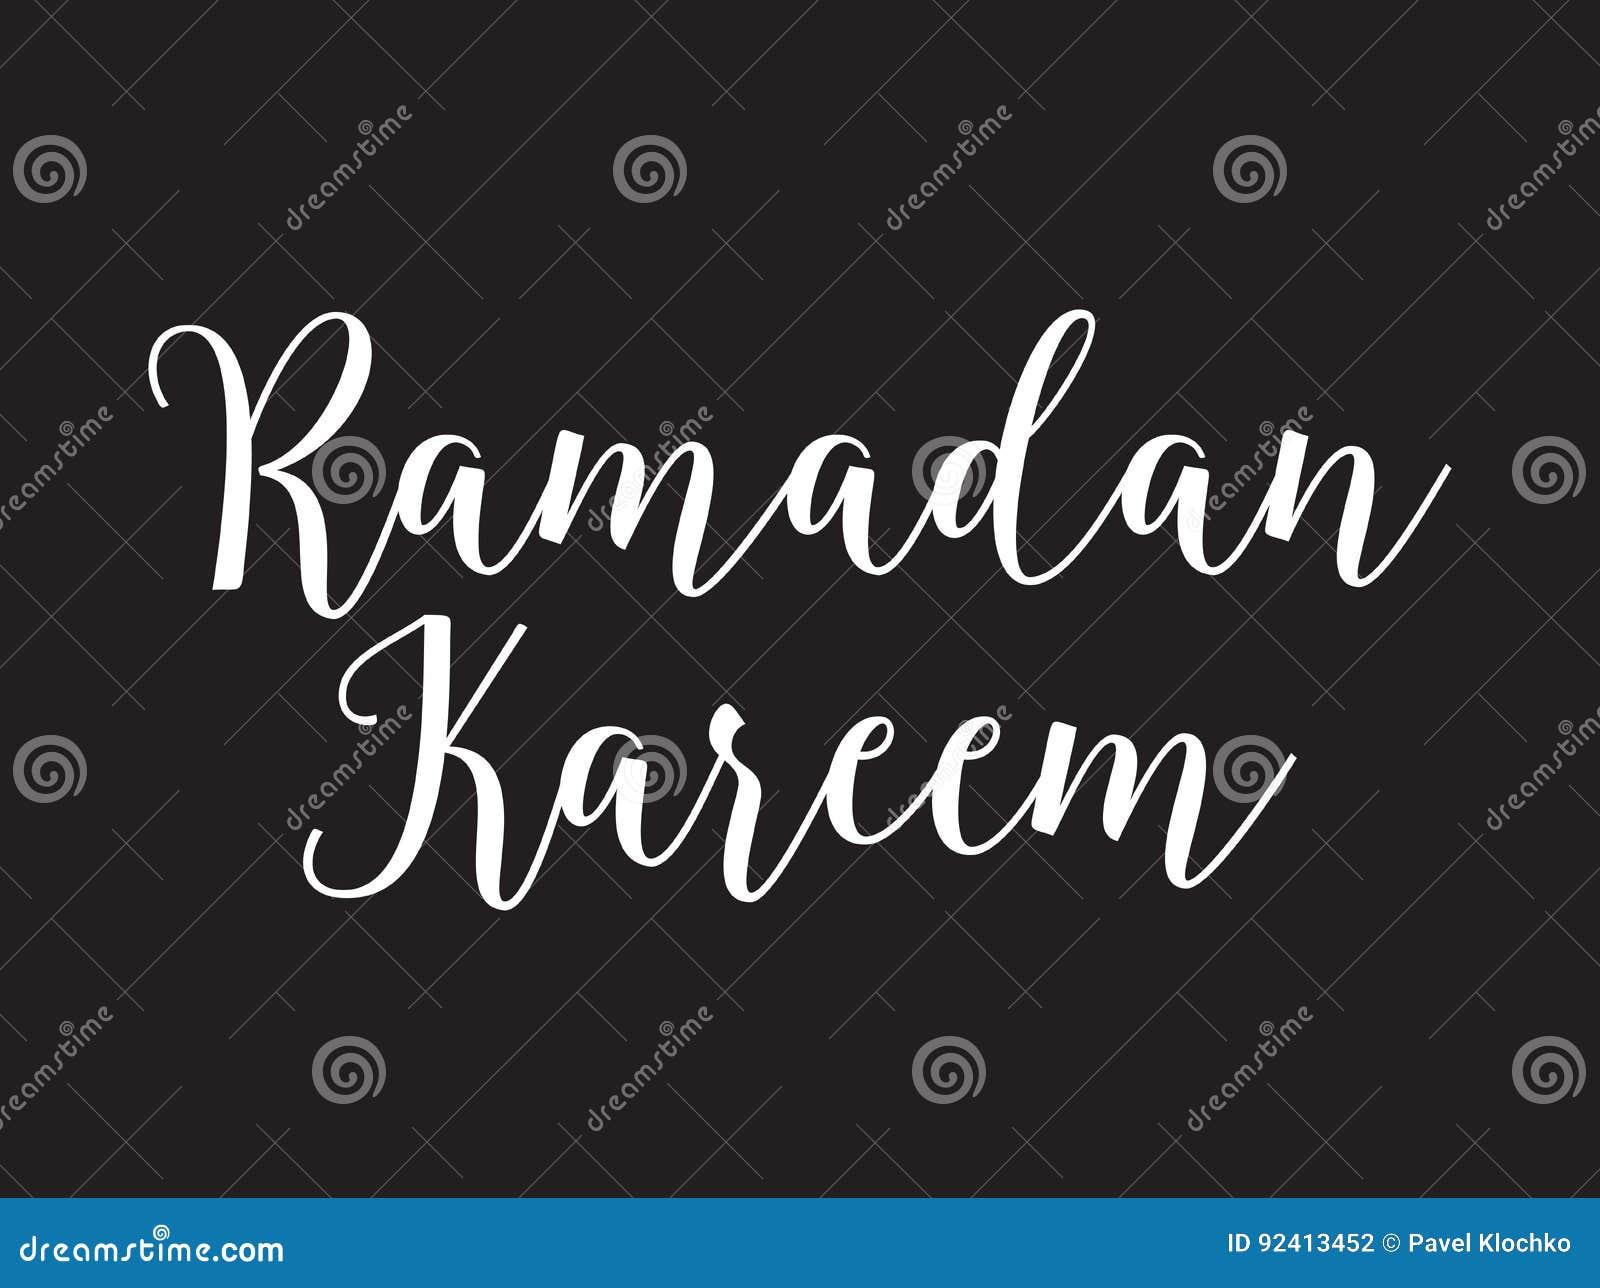 Ramadan Kareem Text Design Stock Vector Illustration Of Greeting